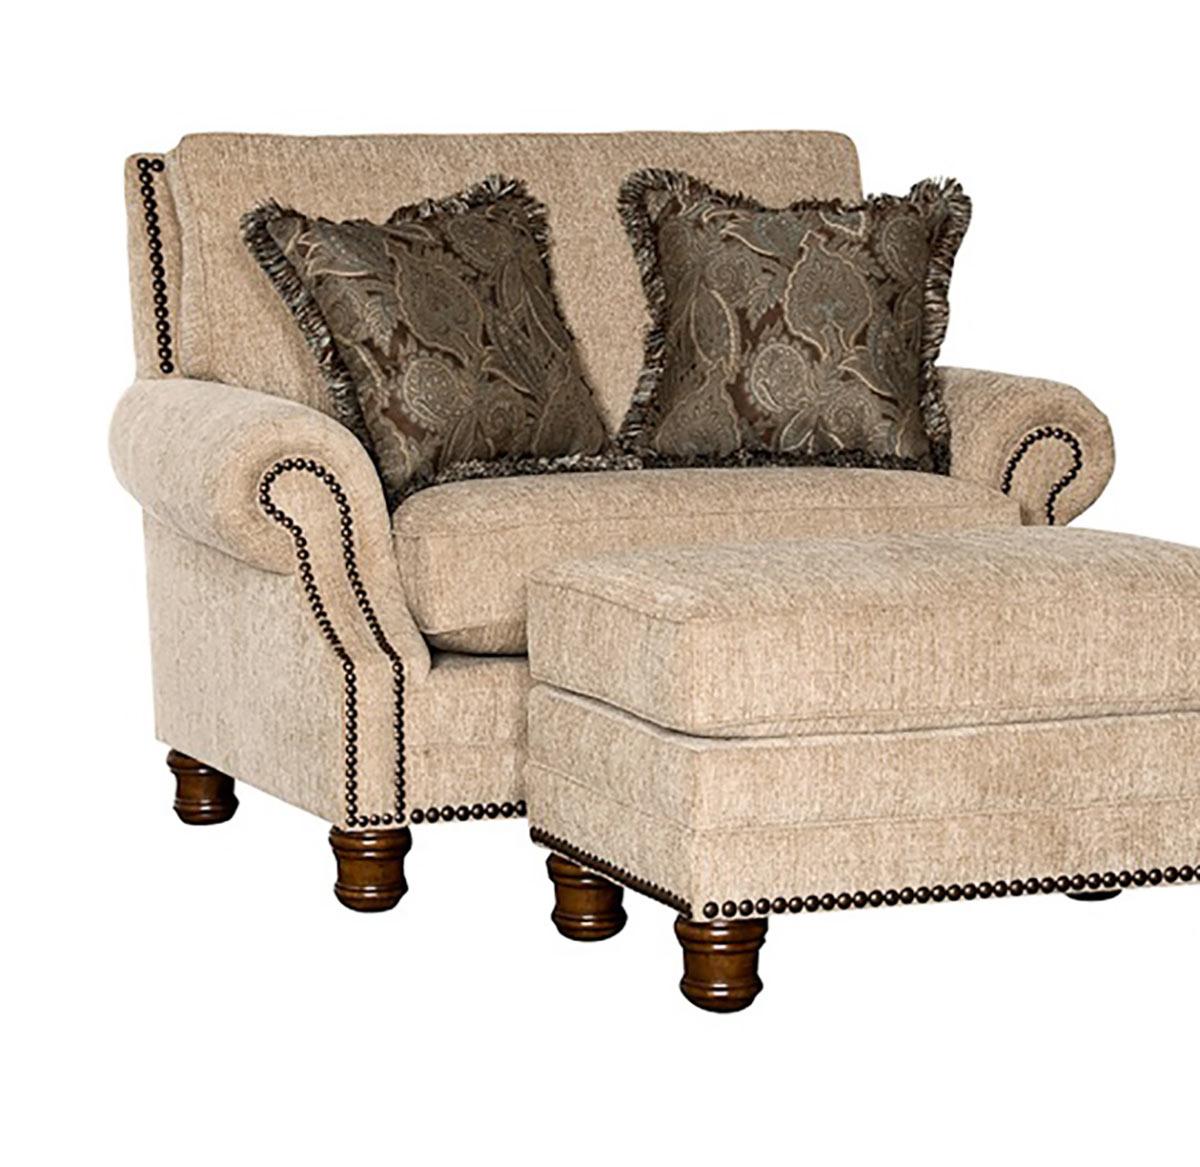 Chelsea Home Templeton Chair - Beige